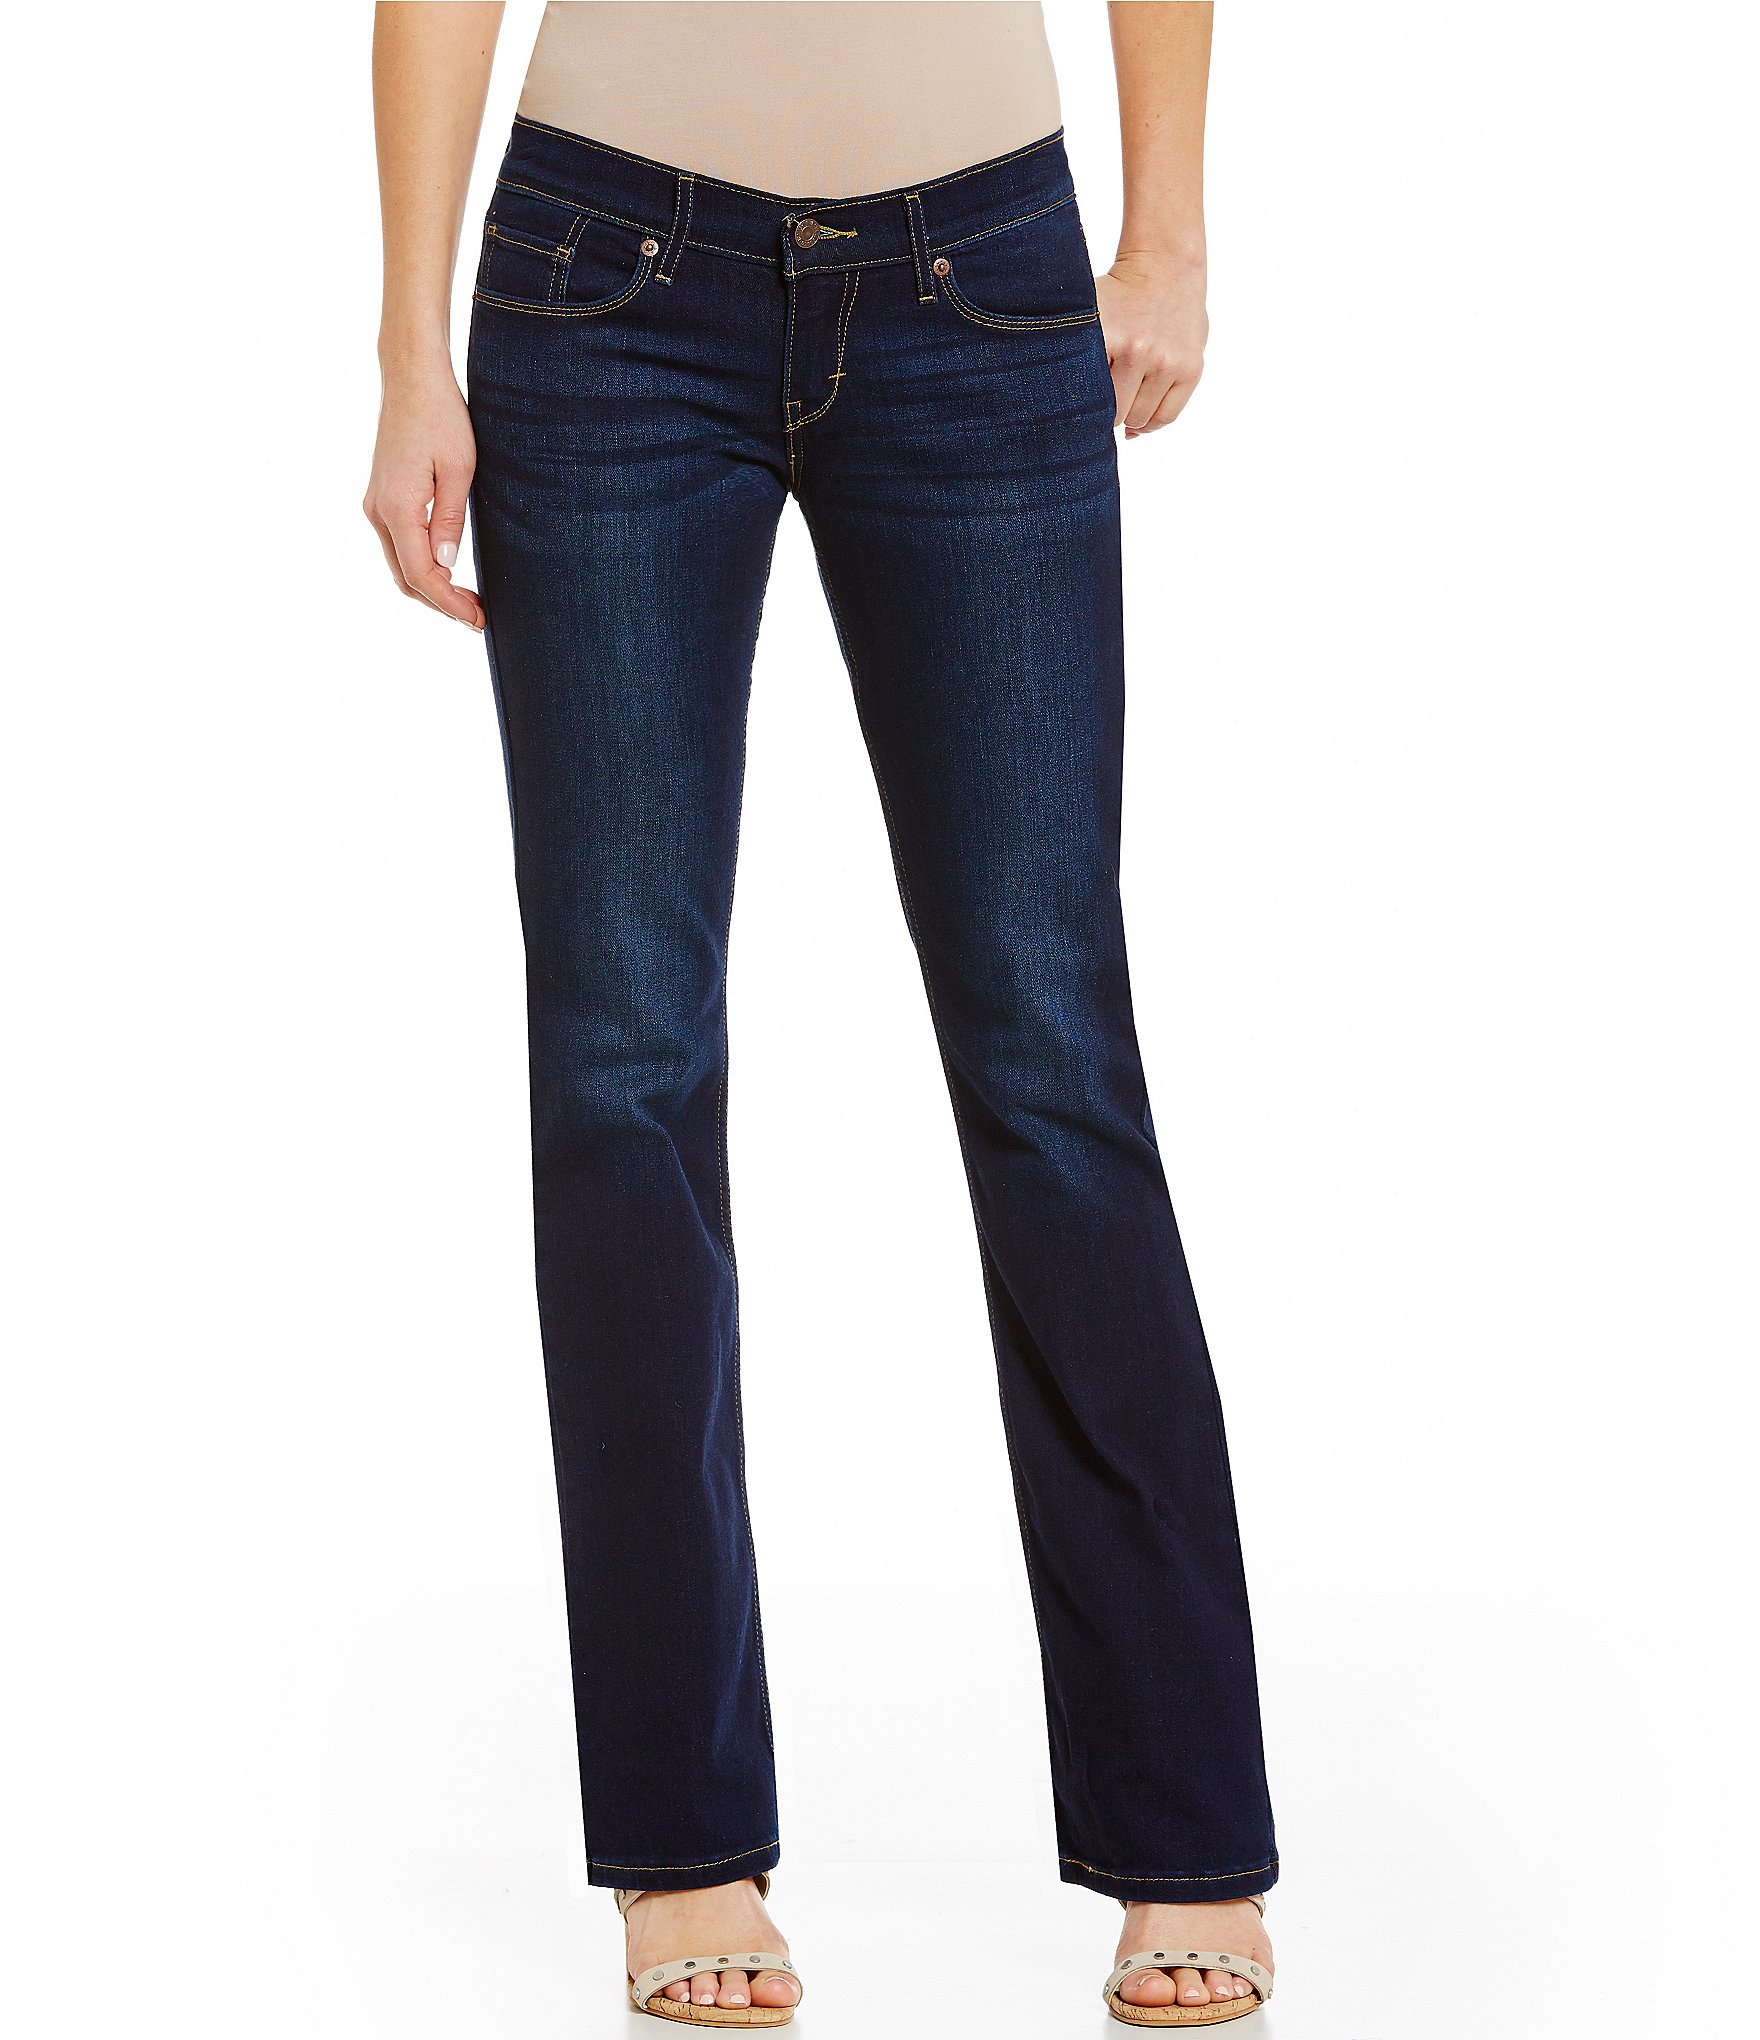 levi s 524 woven stretch bootcut jeans dillards. Black Bedroom Furniture Sets. Home Design Ideas